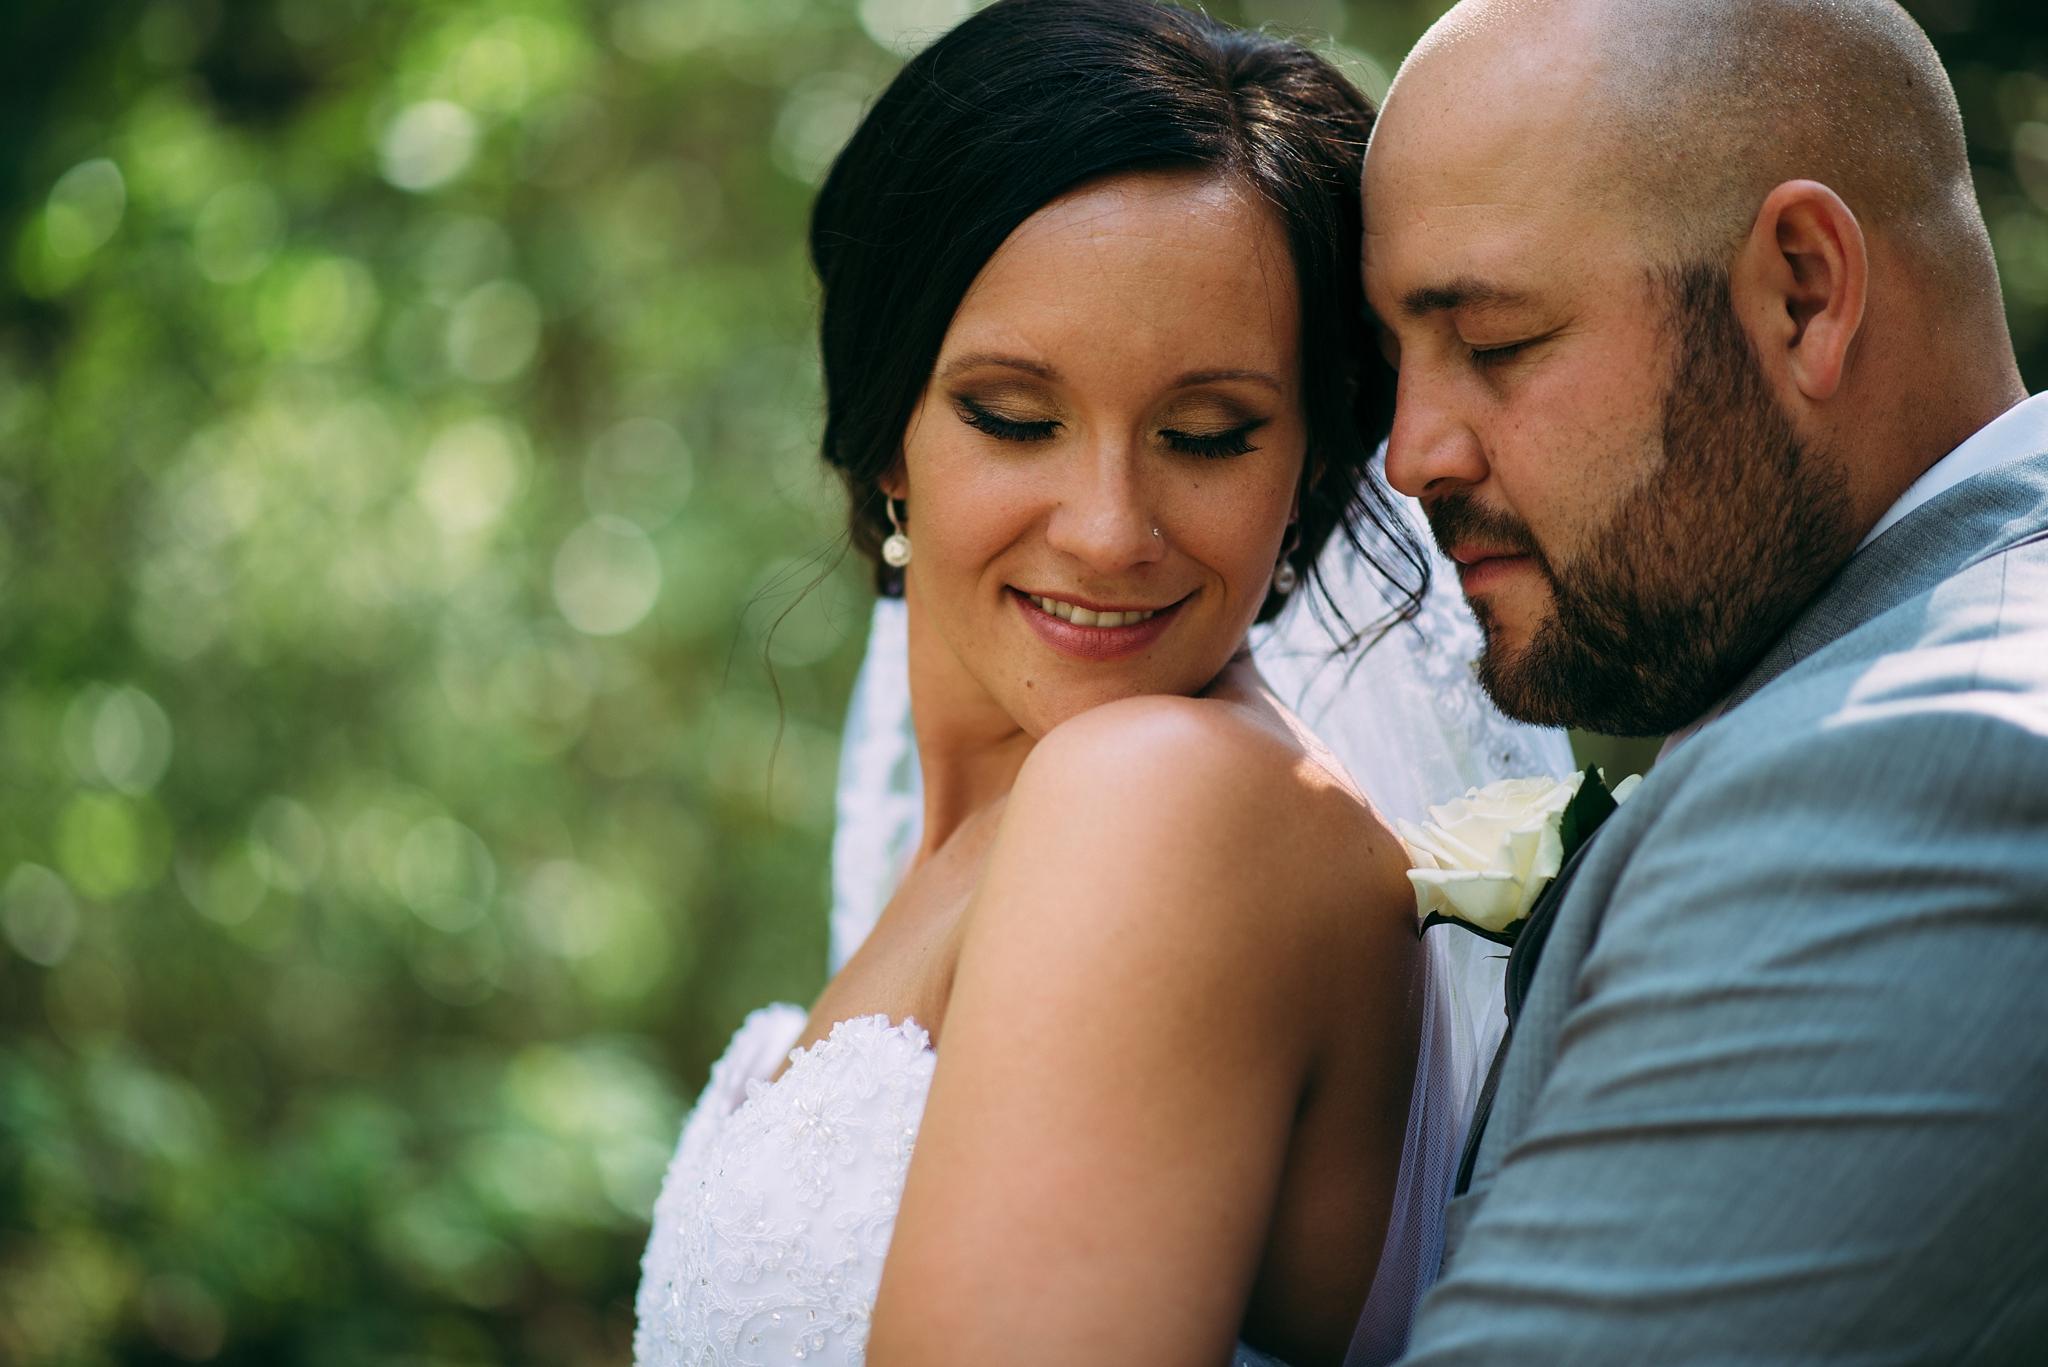 kaihla_tonai_intimate_wedding_elopement_photographer_1541